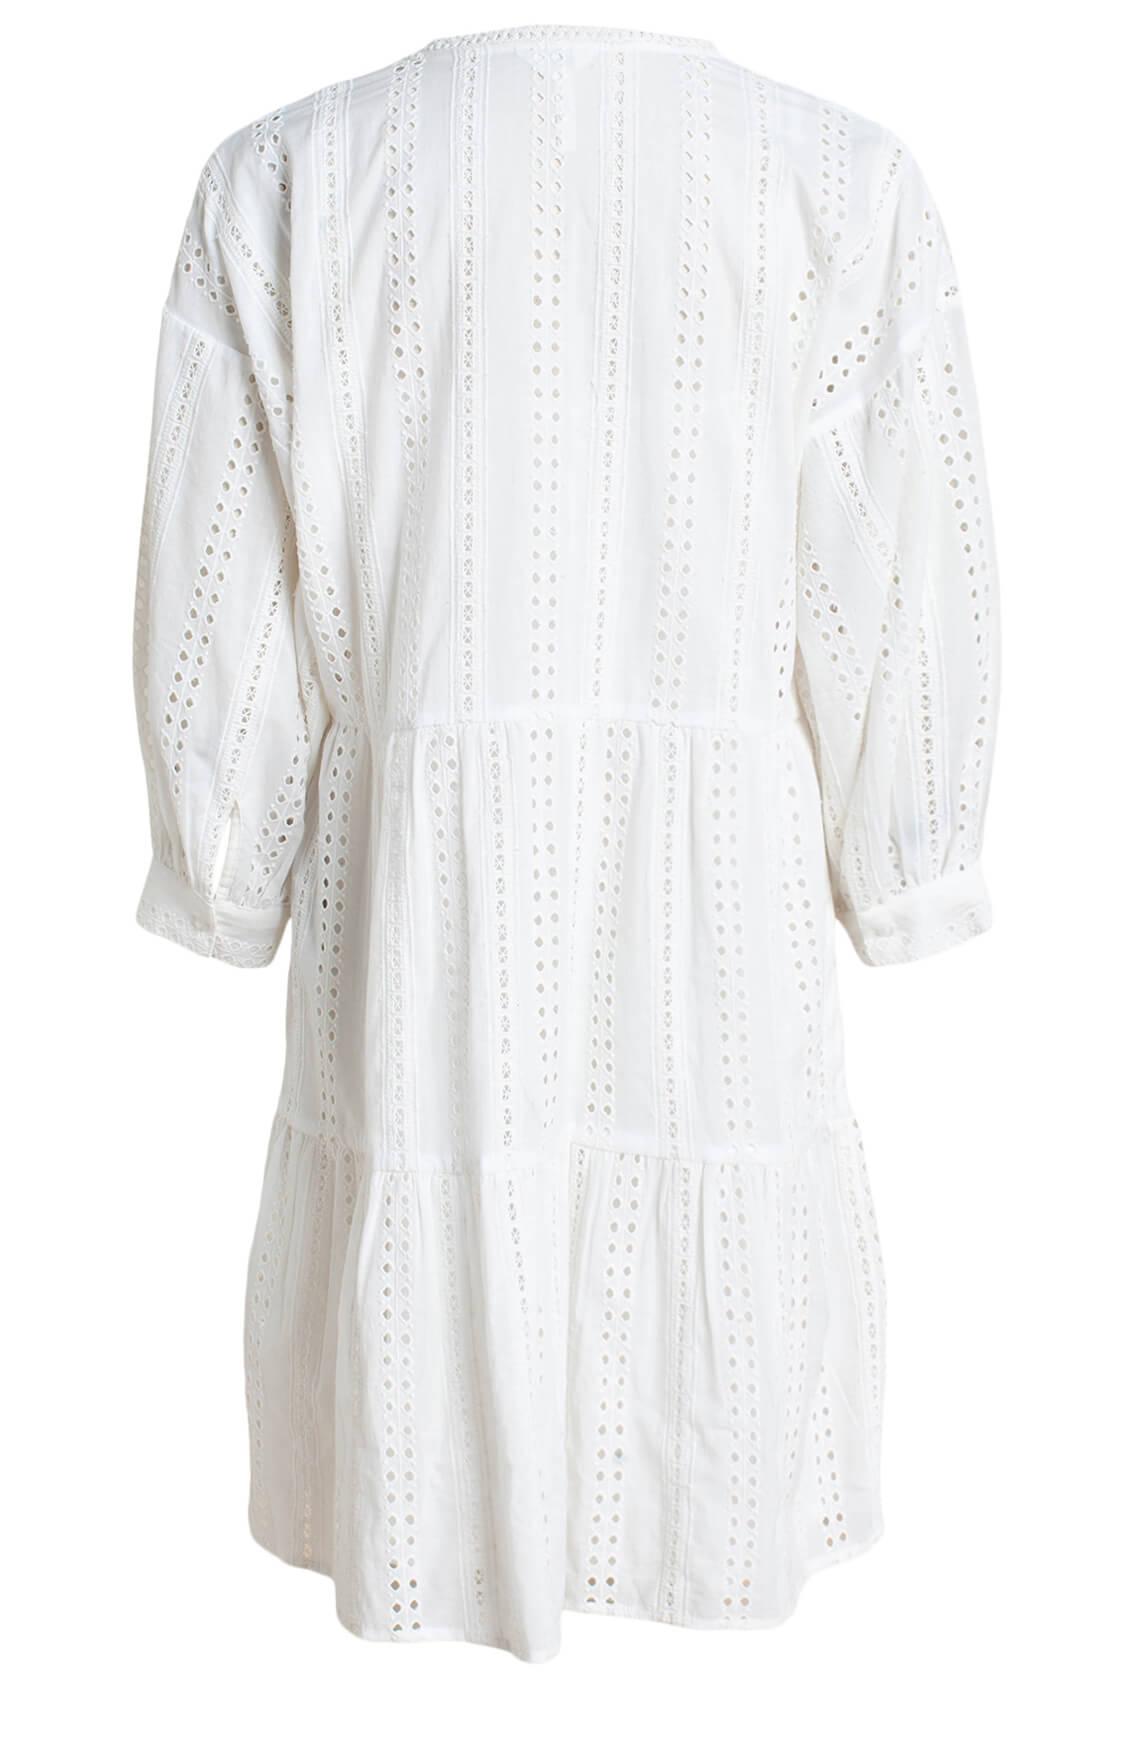 Object Dames Erin broderie jurk wit